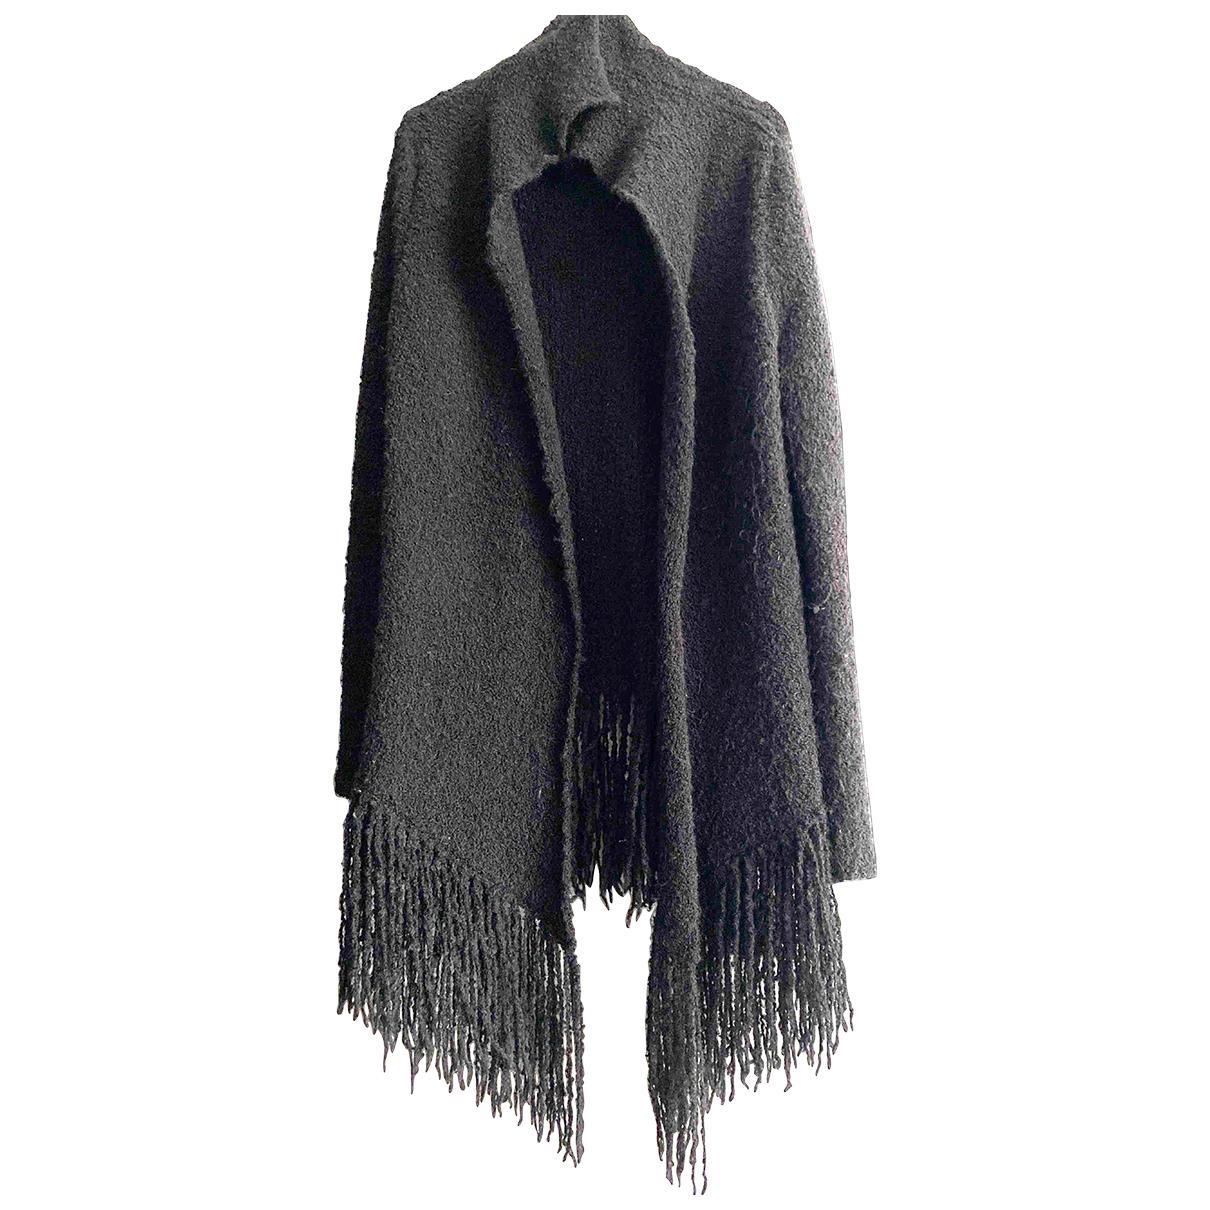 Zadig & Voltaire N Black Wool Knitwear for Women M International